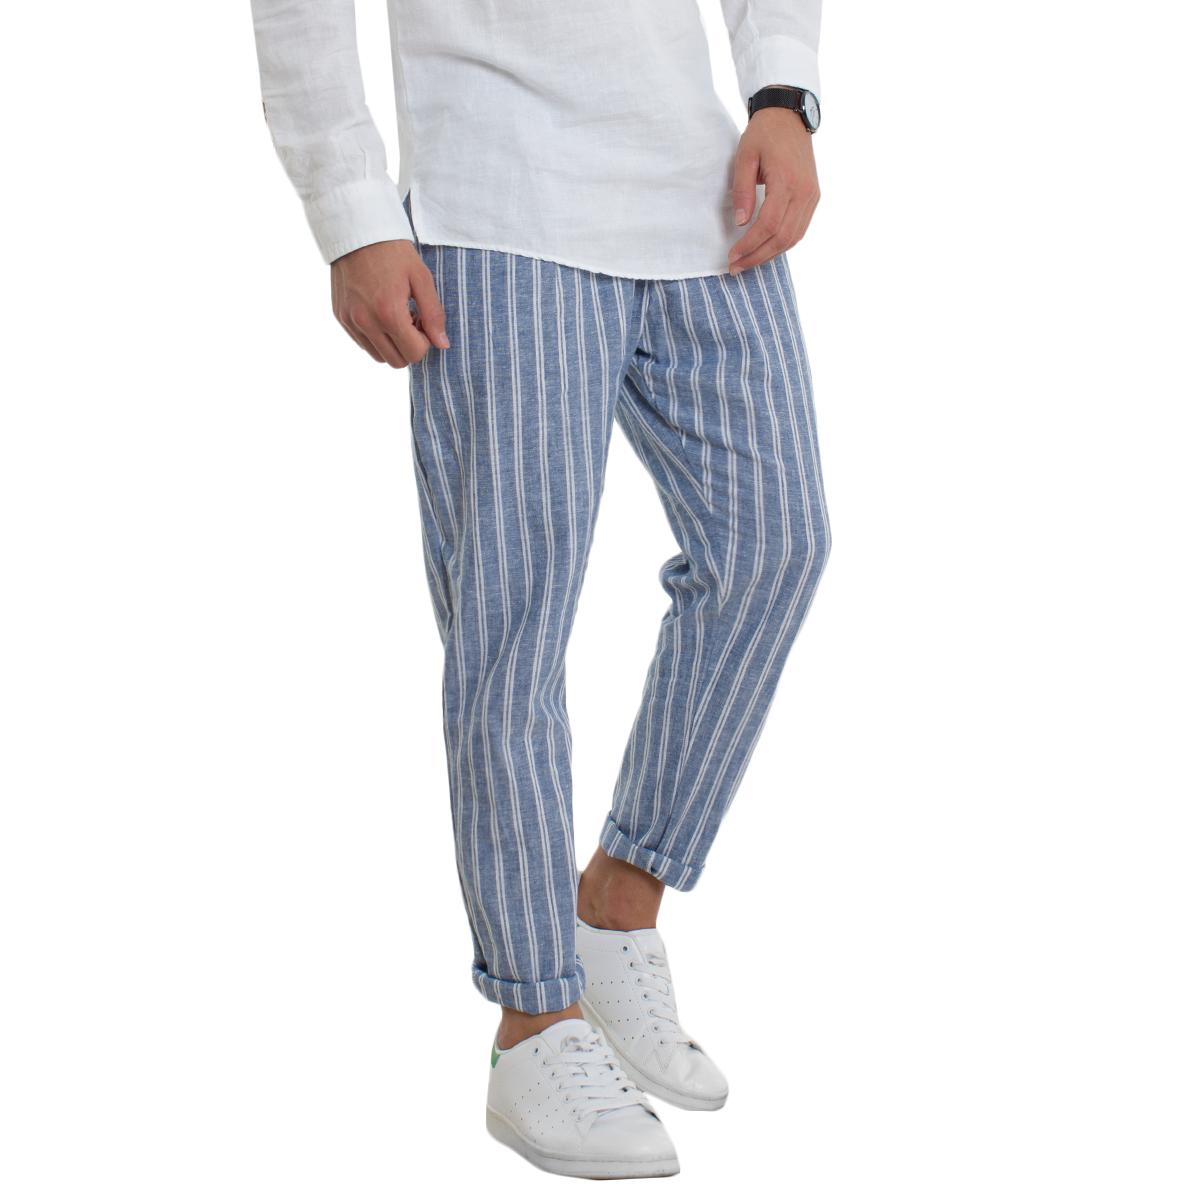 3b4de59e2 Hombre elástico pantalones holgados casuales lino rayas azul líneas  GIOSAL-P1708A